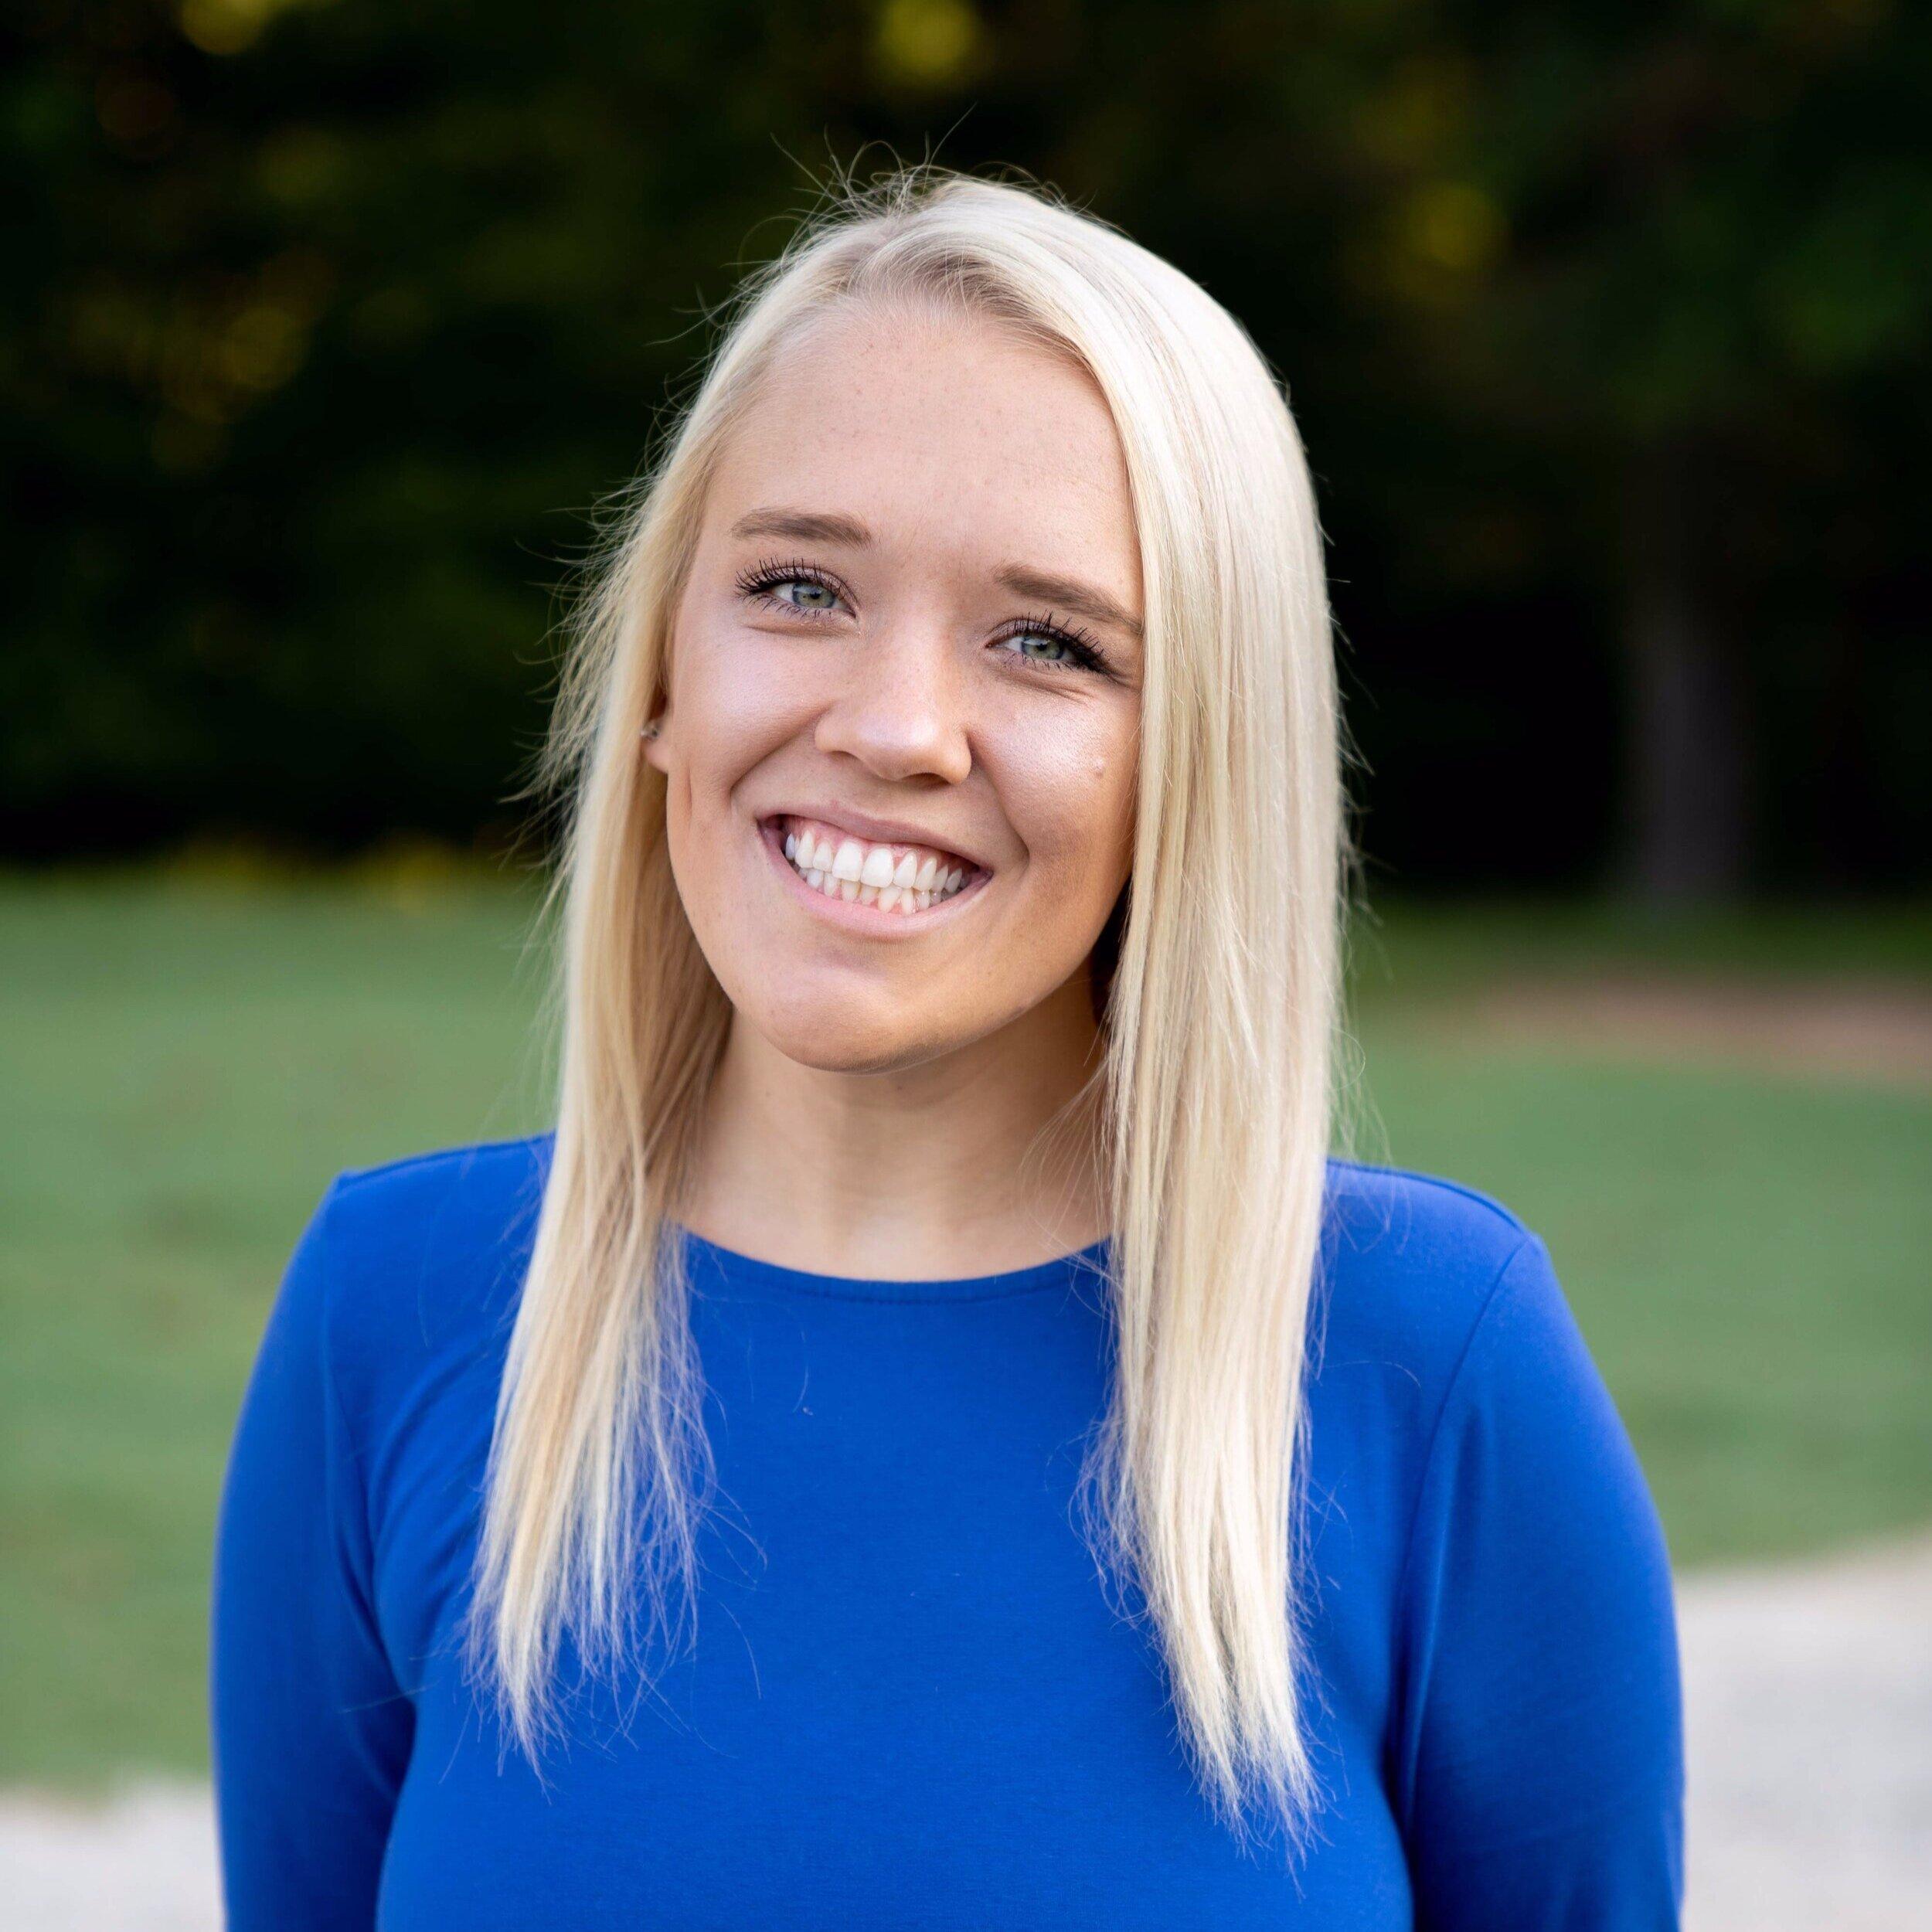 Site Director - Samantha Harp